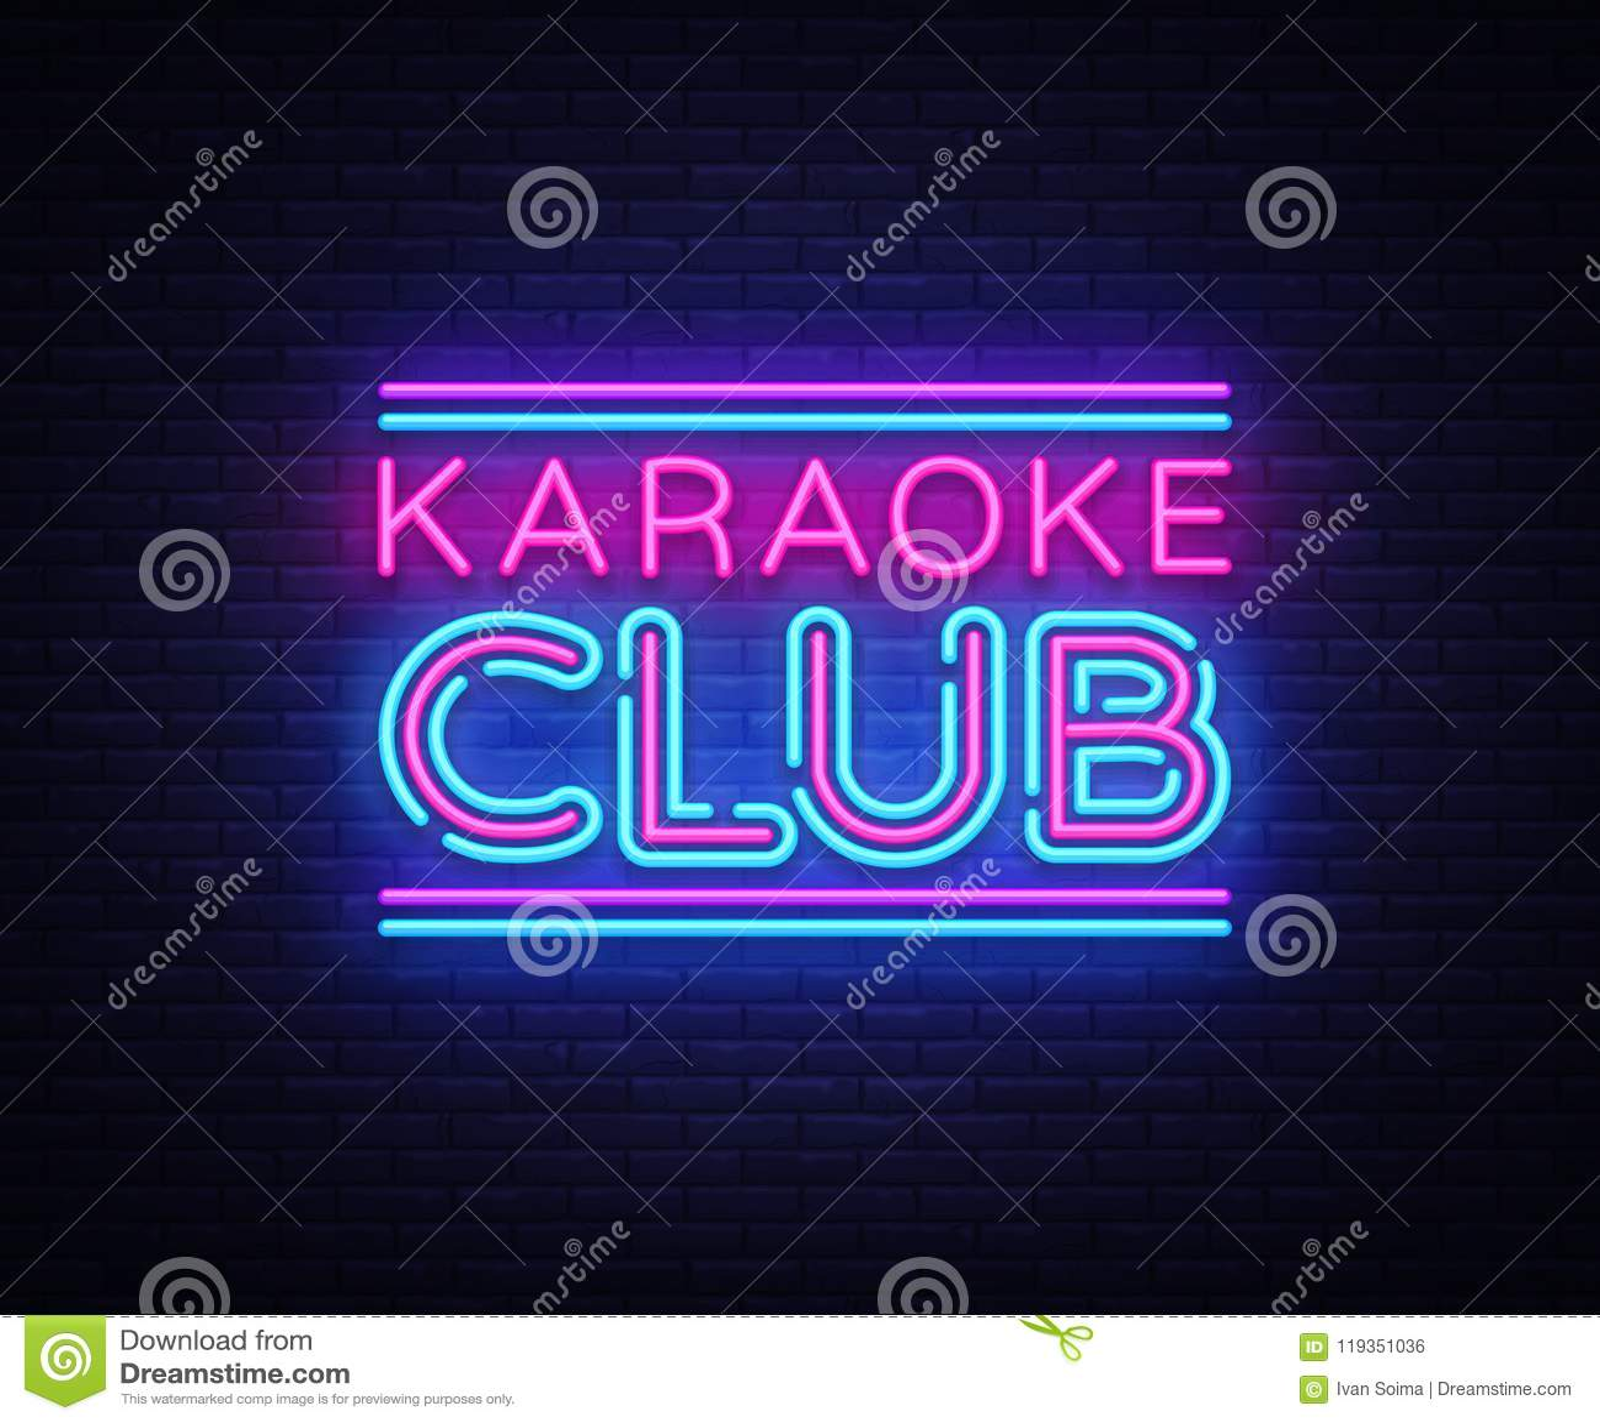 karaoke club neon sign vector karaoke design template neon sign